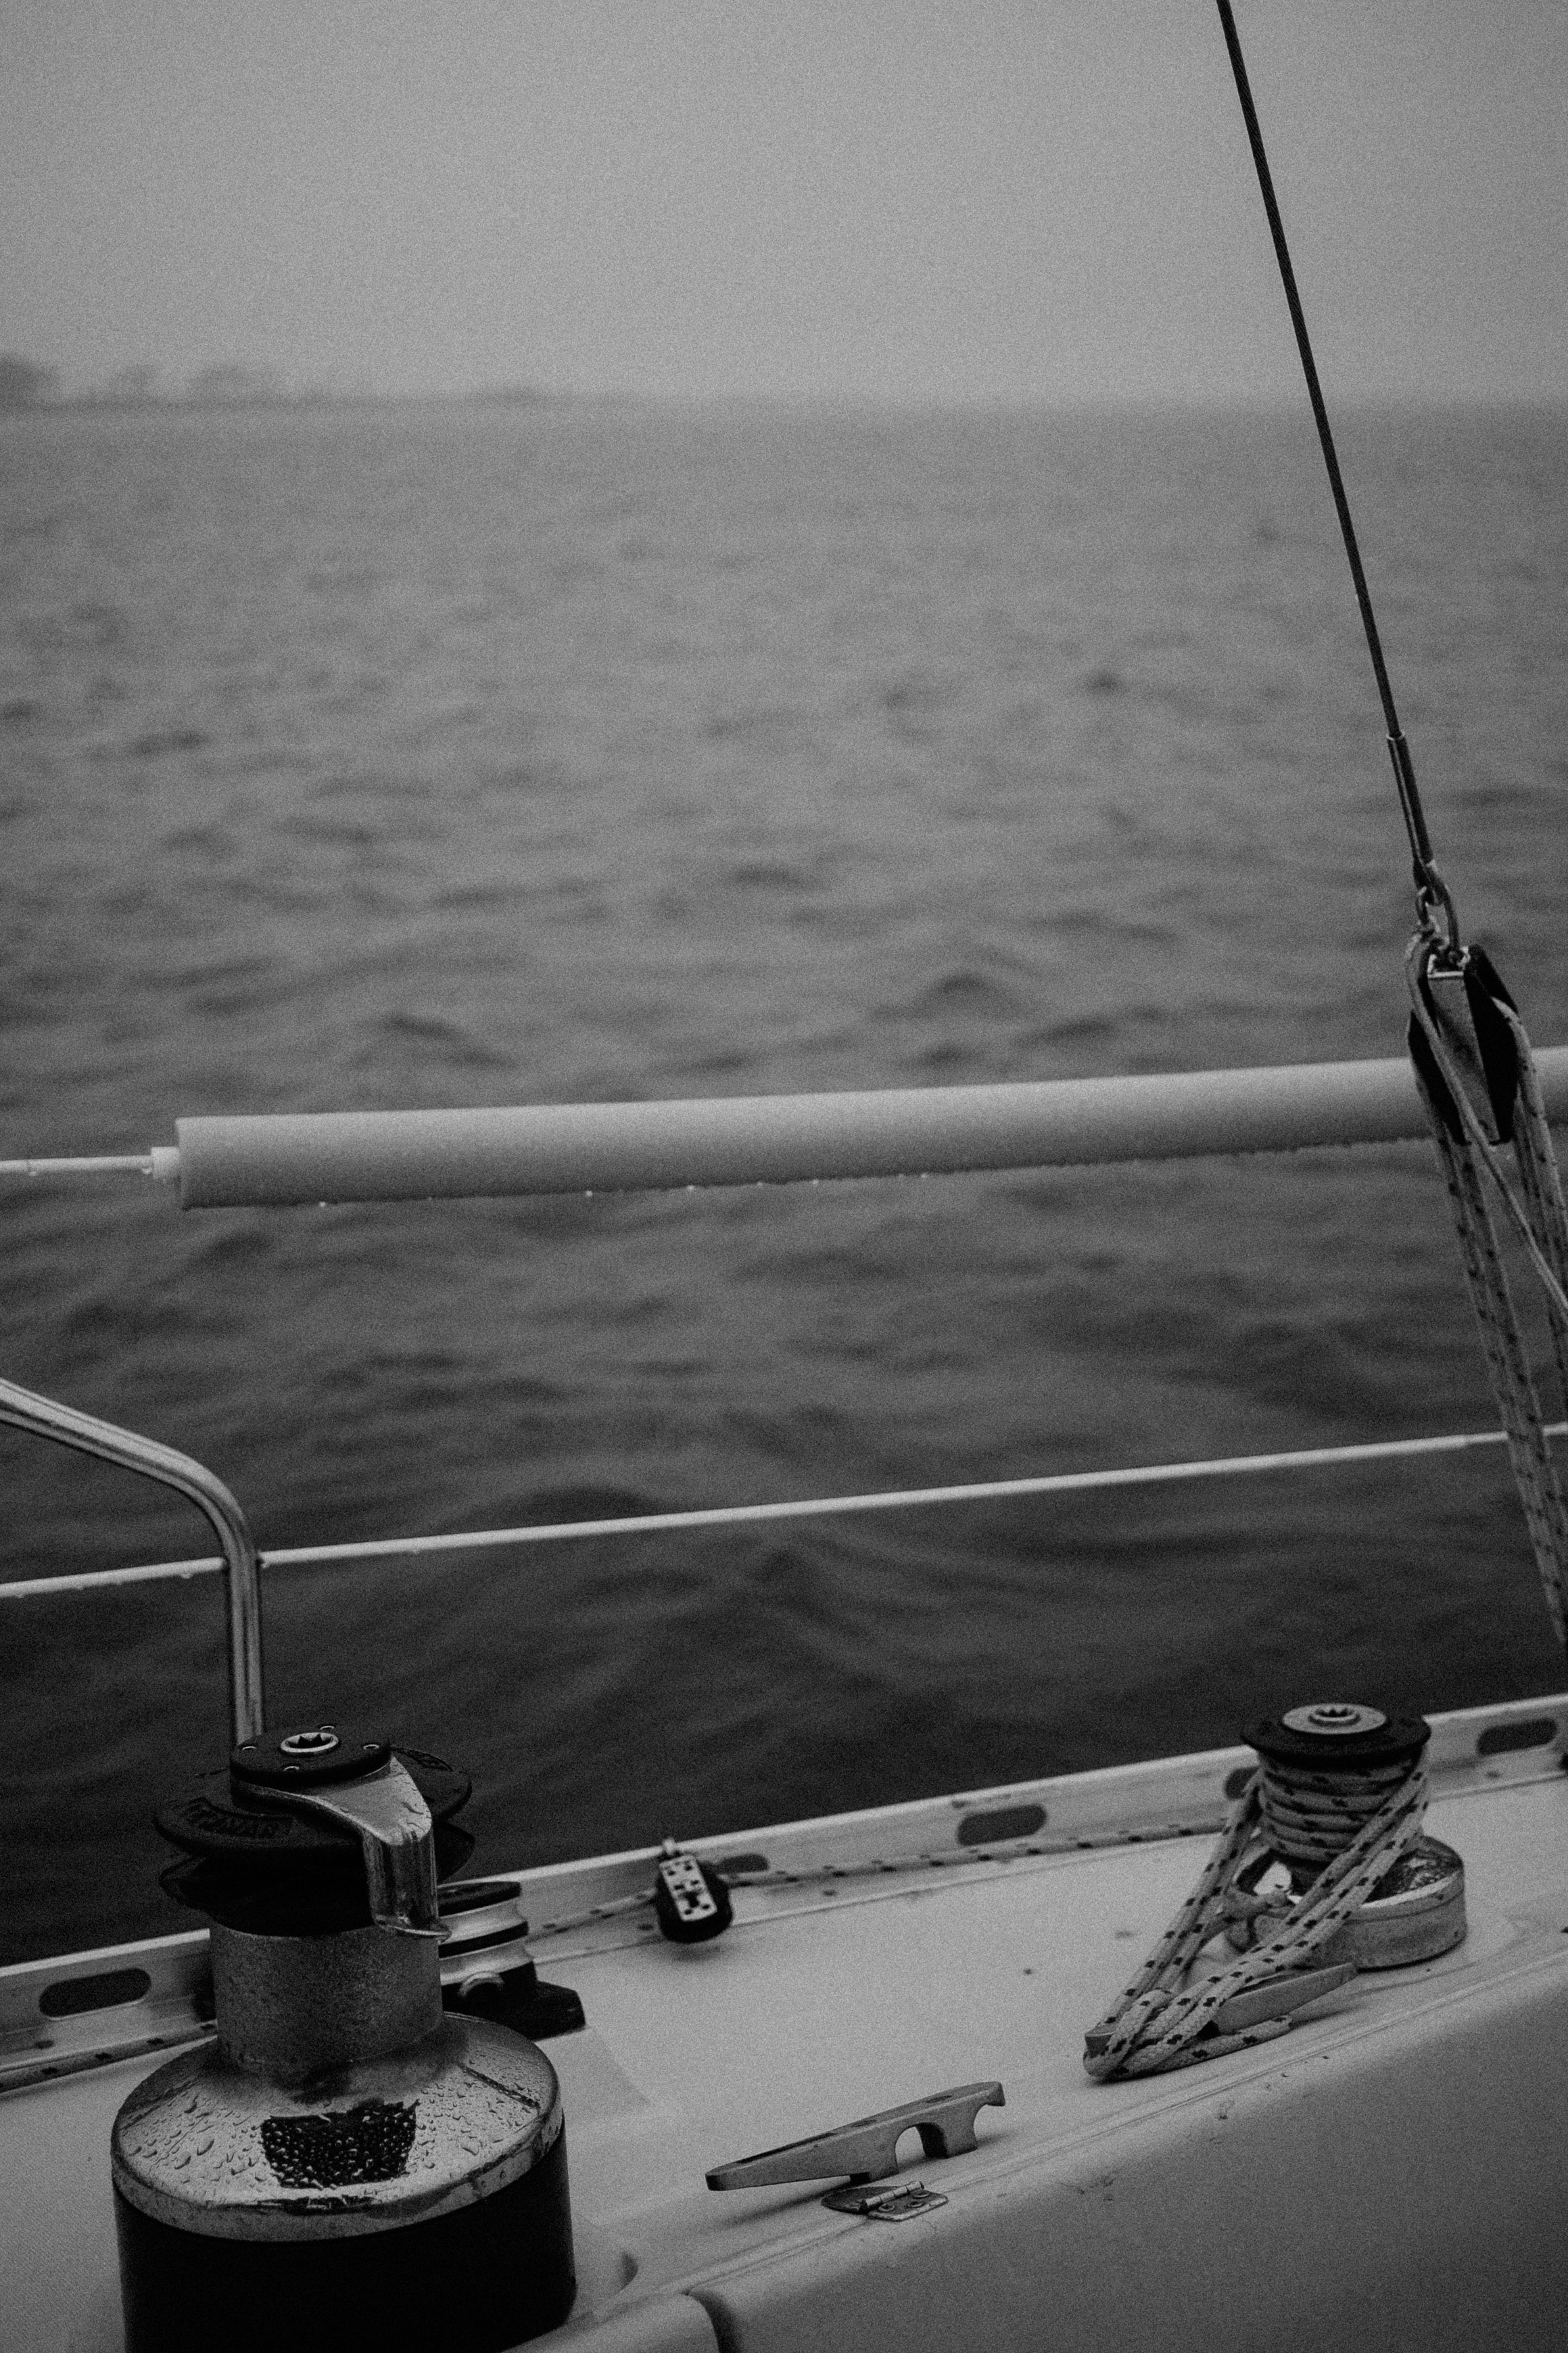 sailing-with-papa-5543.jpg